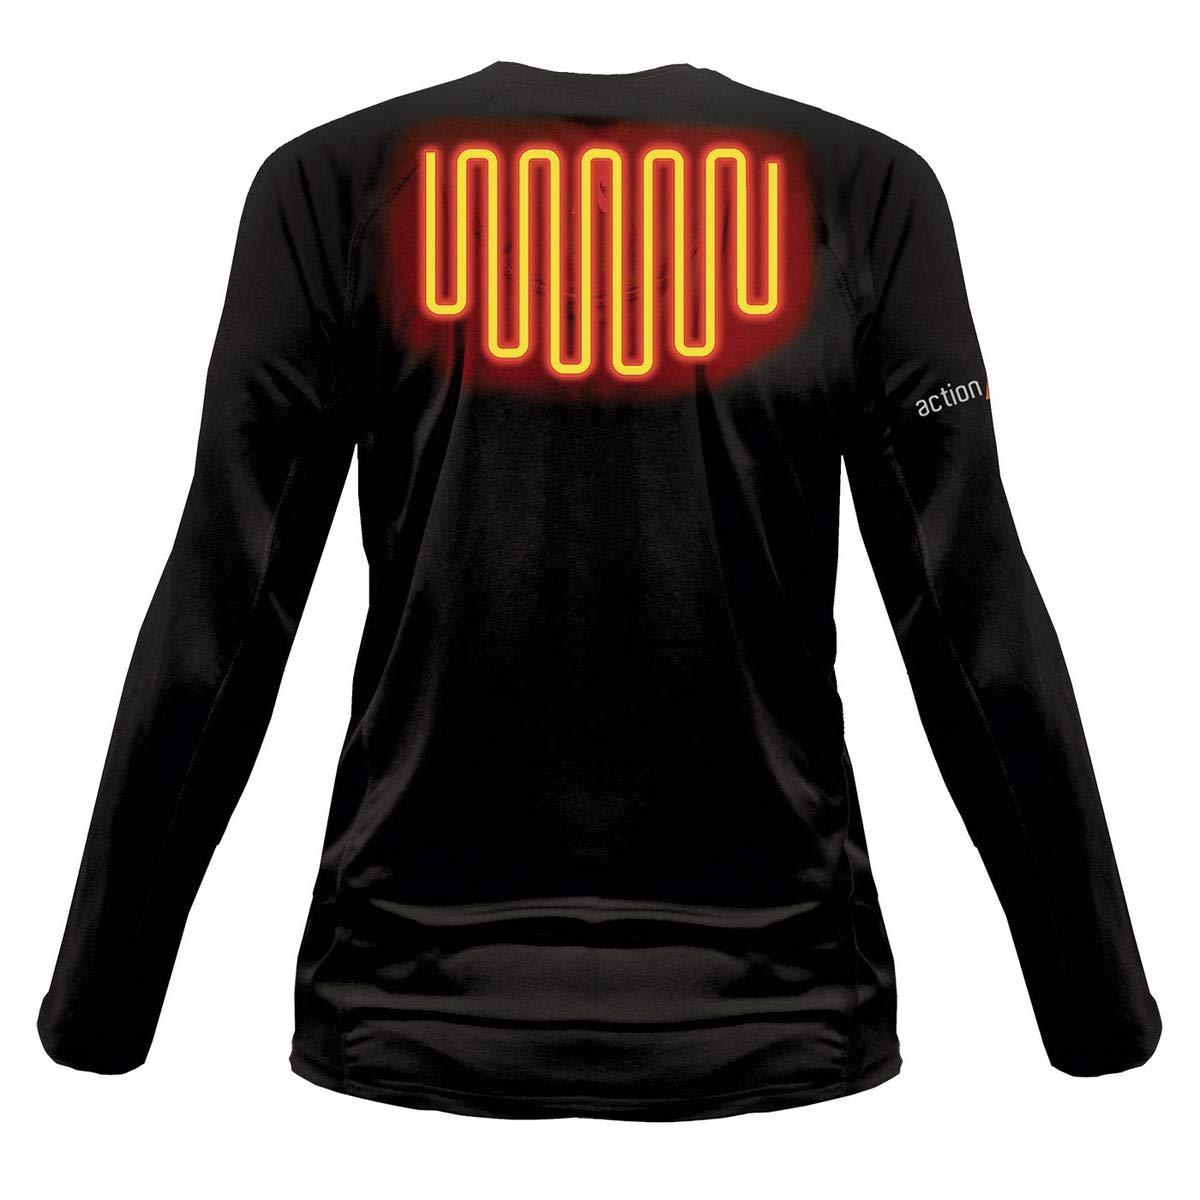 ActionHeat 5V Heated Base Layer Shirt Womens